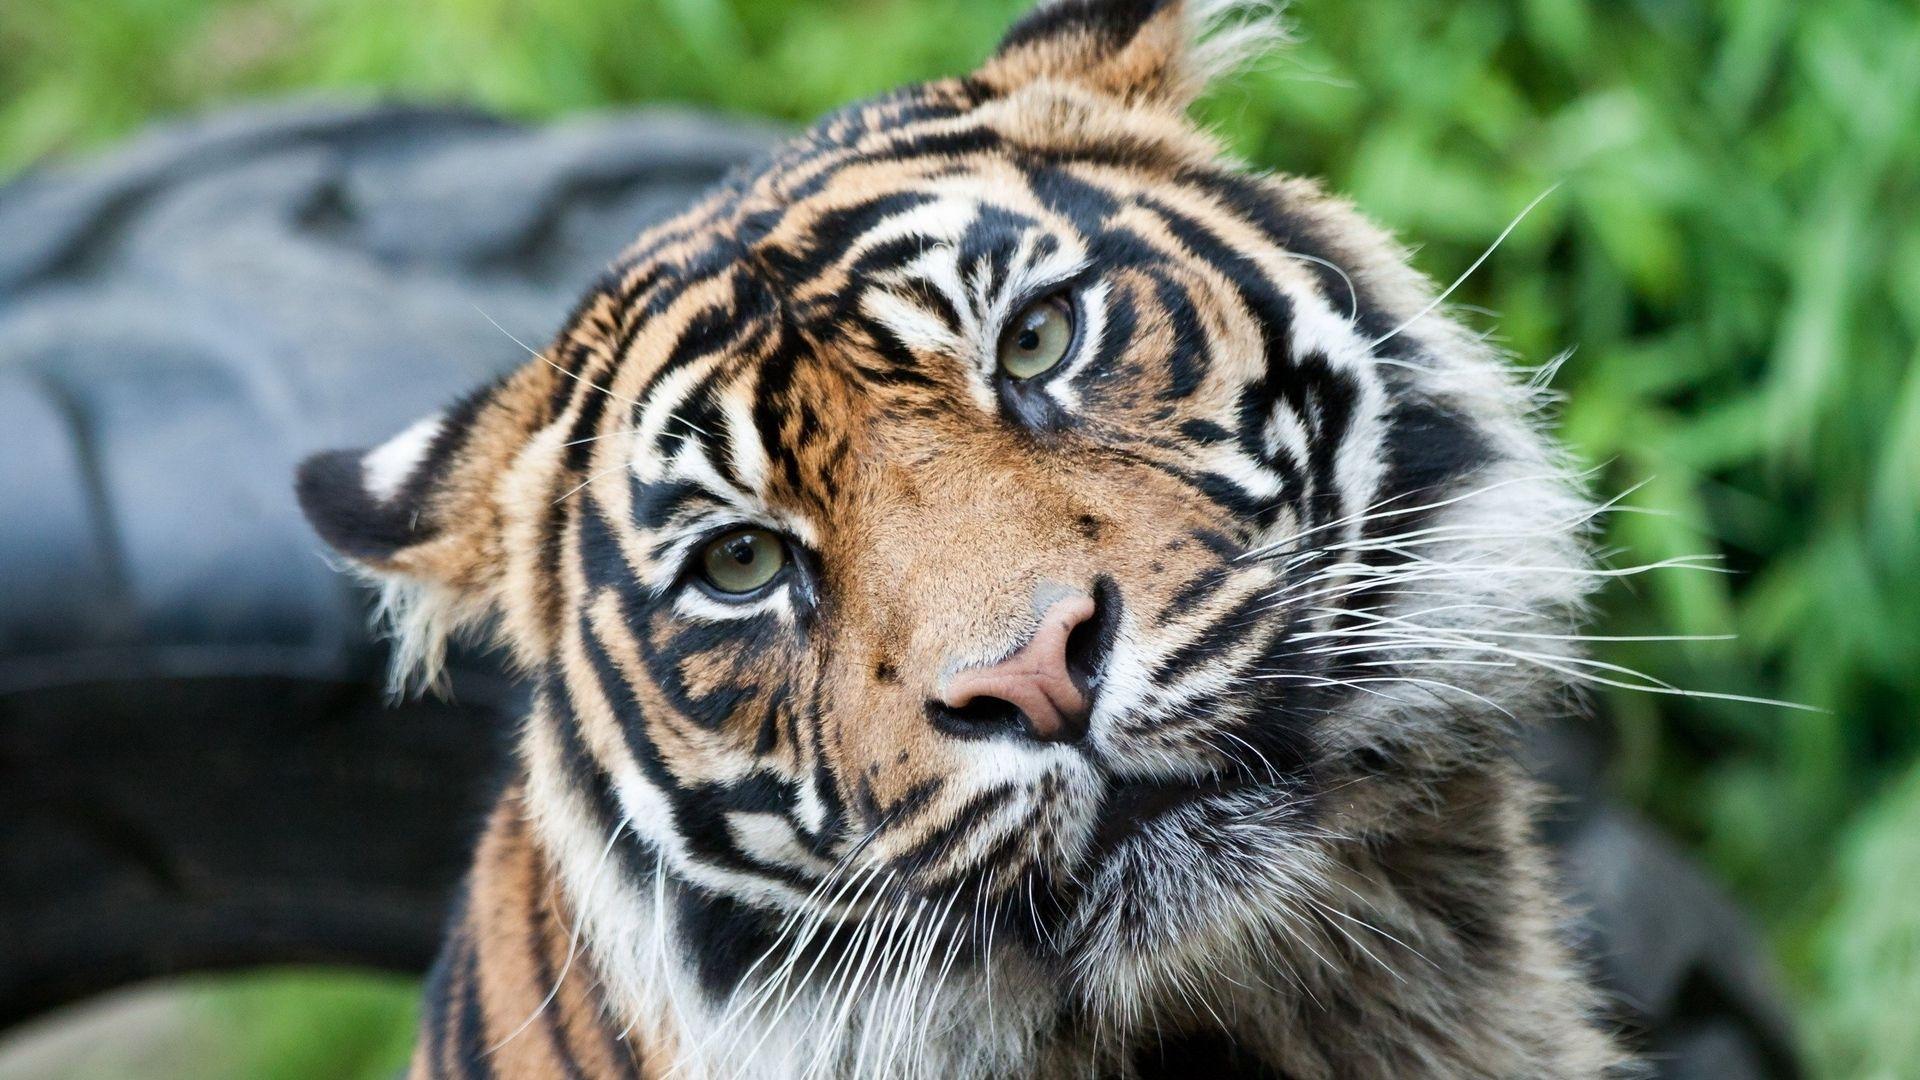 Tiger, Free Desktop Wallpaper